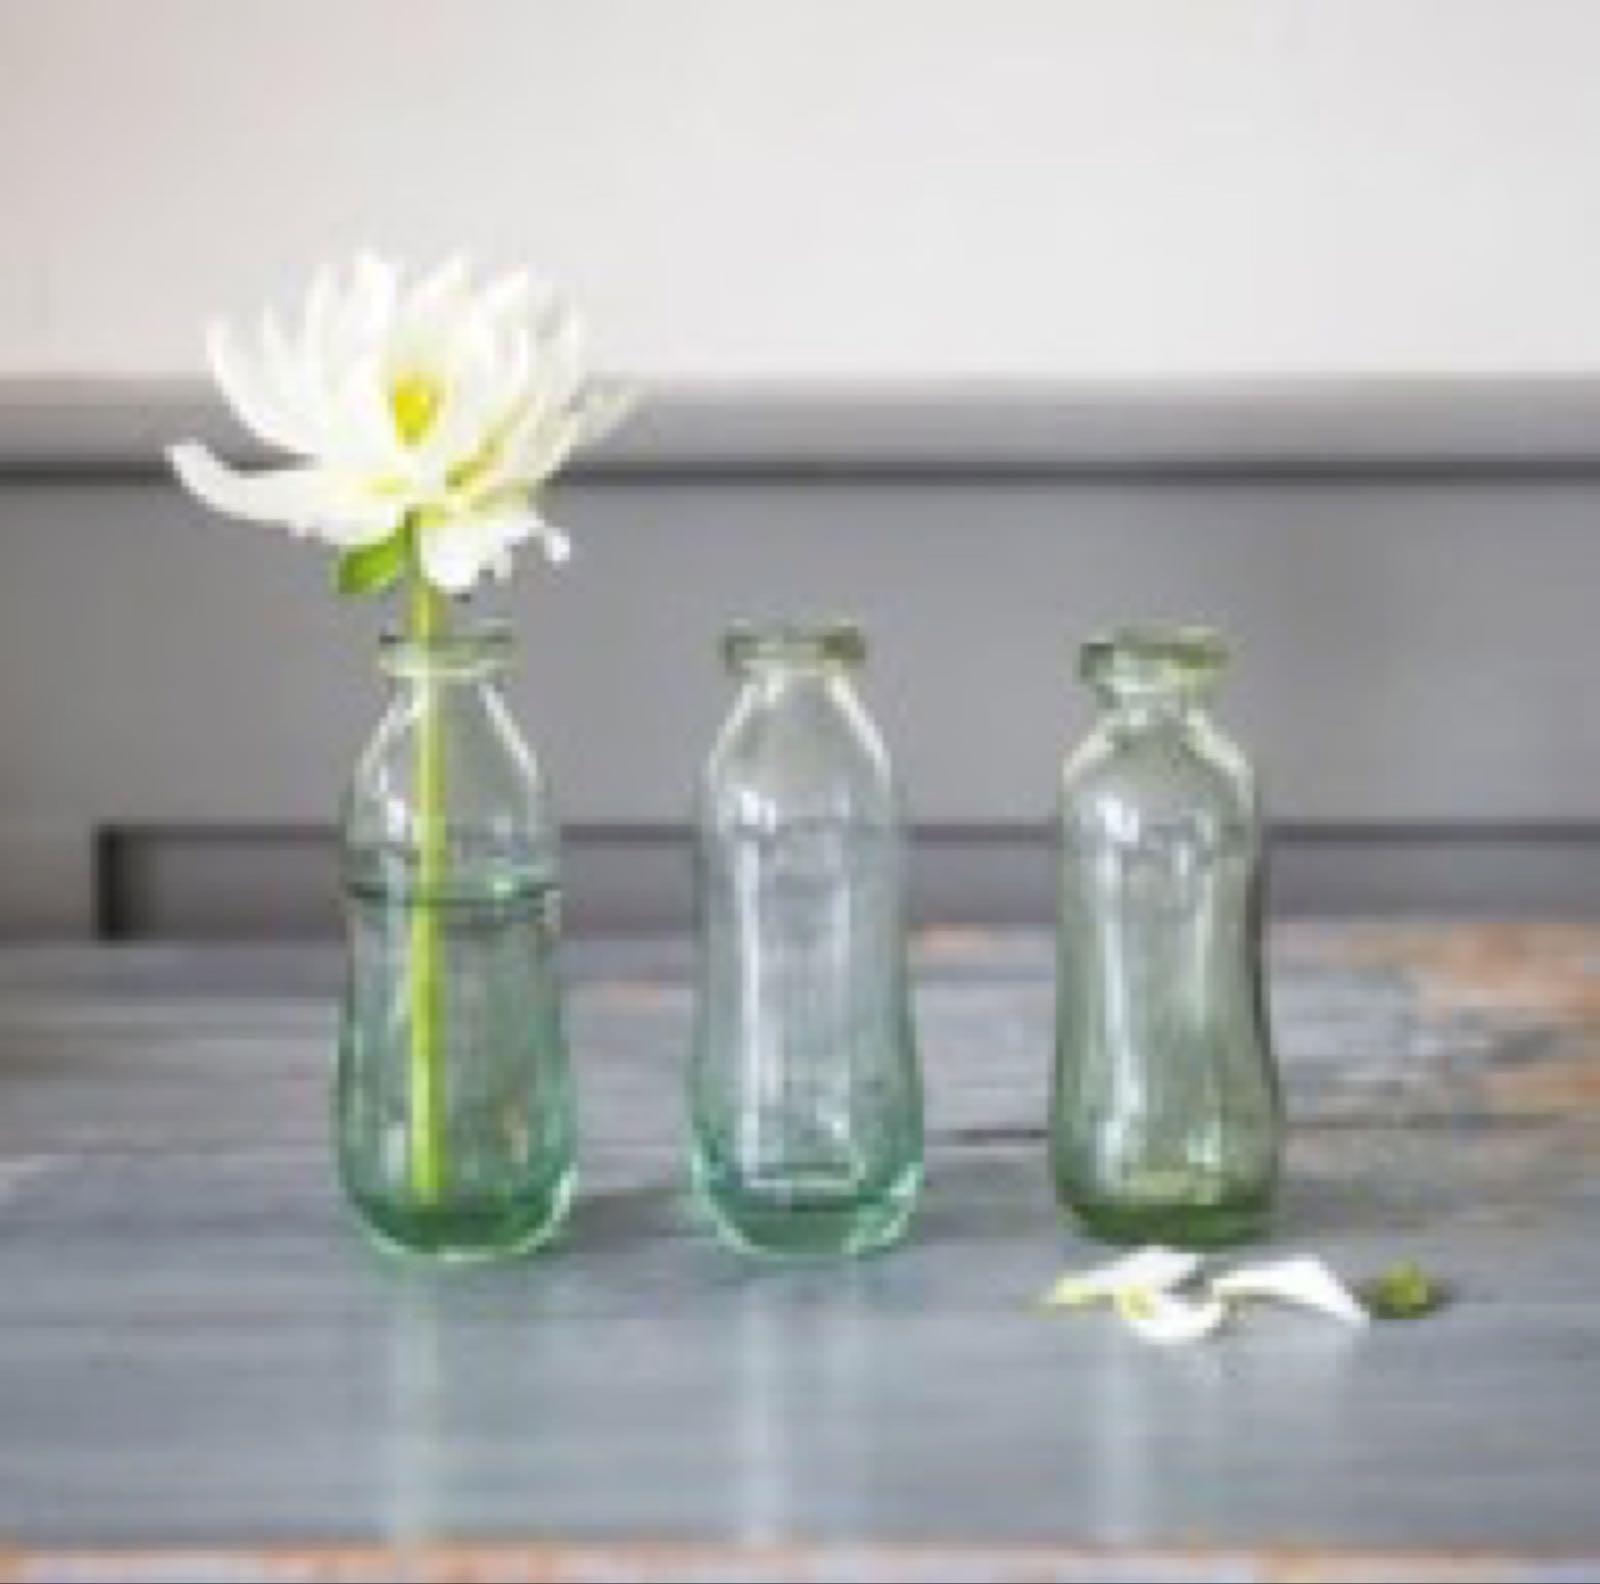 Set of 3 bottles